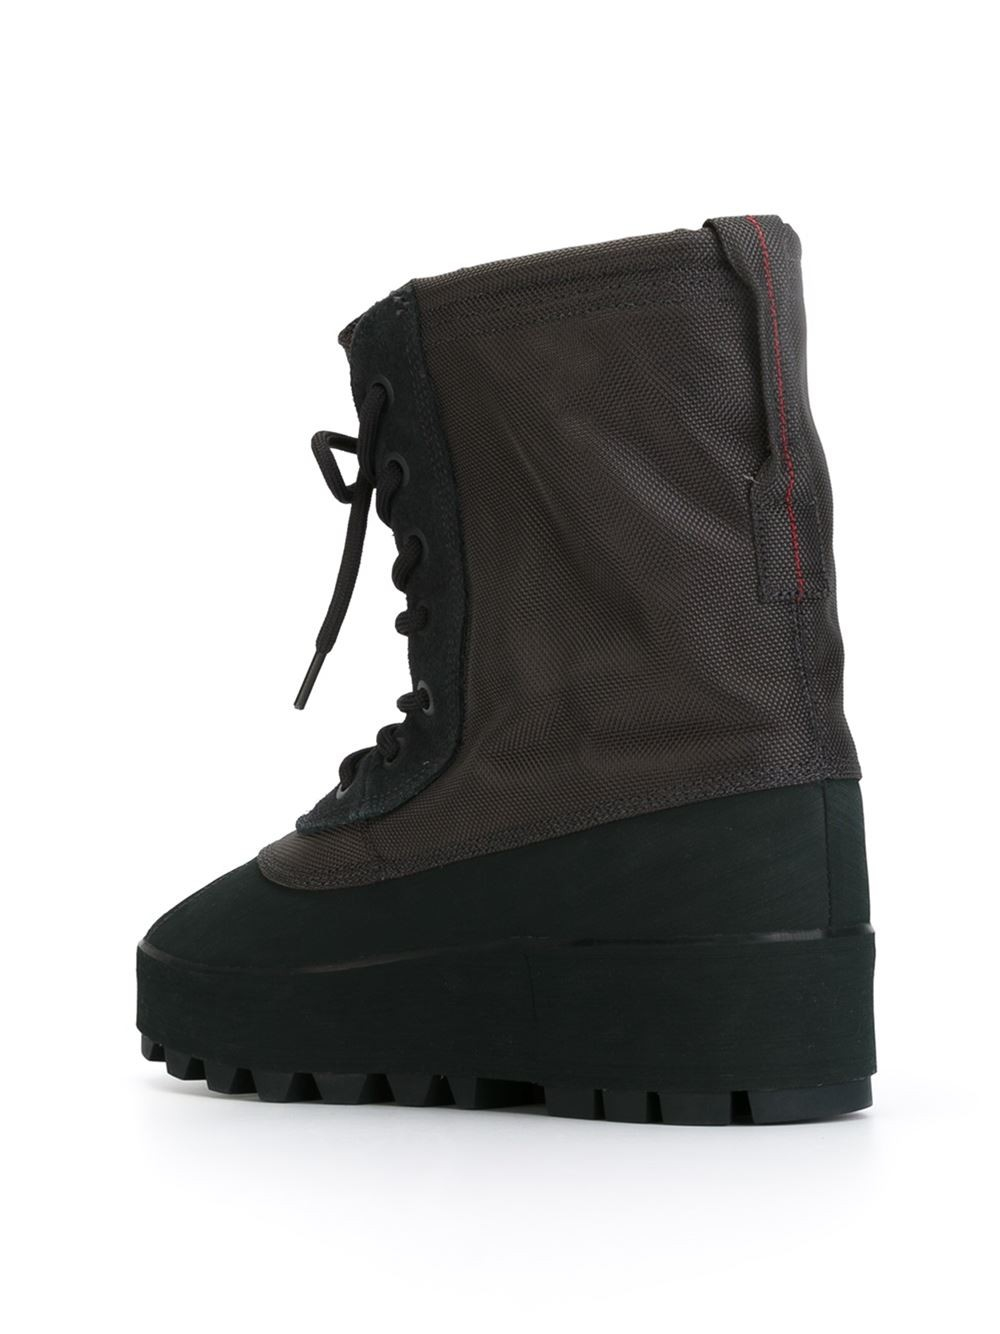 New Kanye Westu2019s Yeezy Season 3 Collection Includes Black Heeled Booties | Footwear News